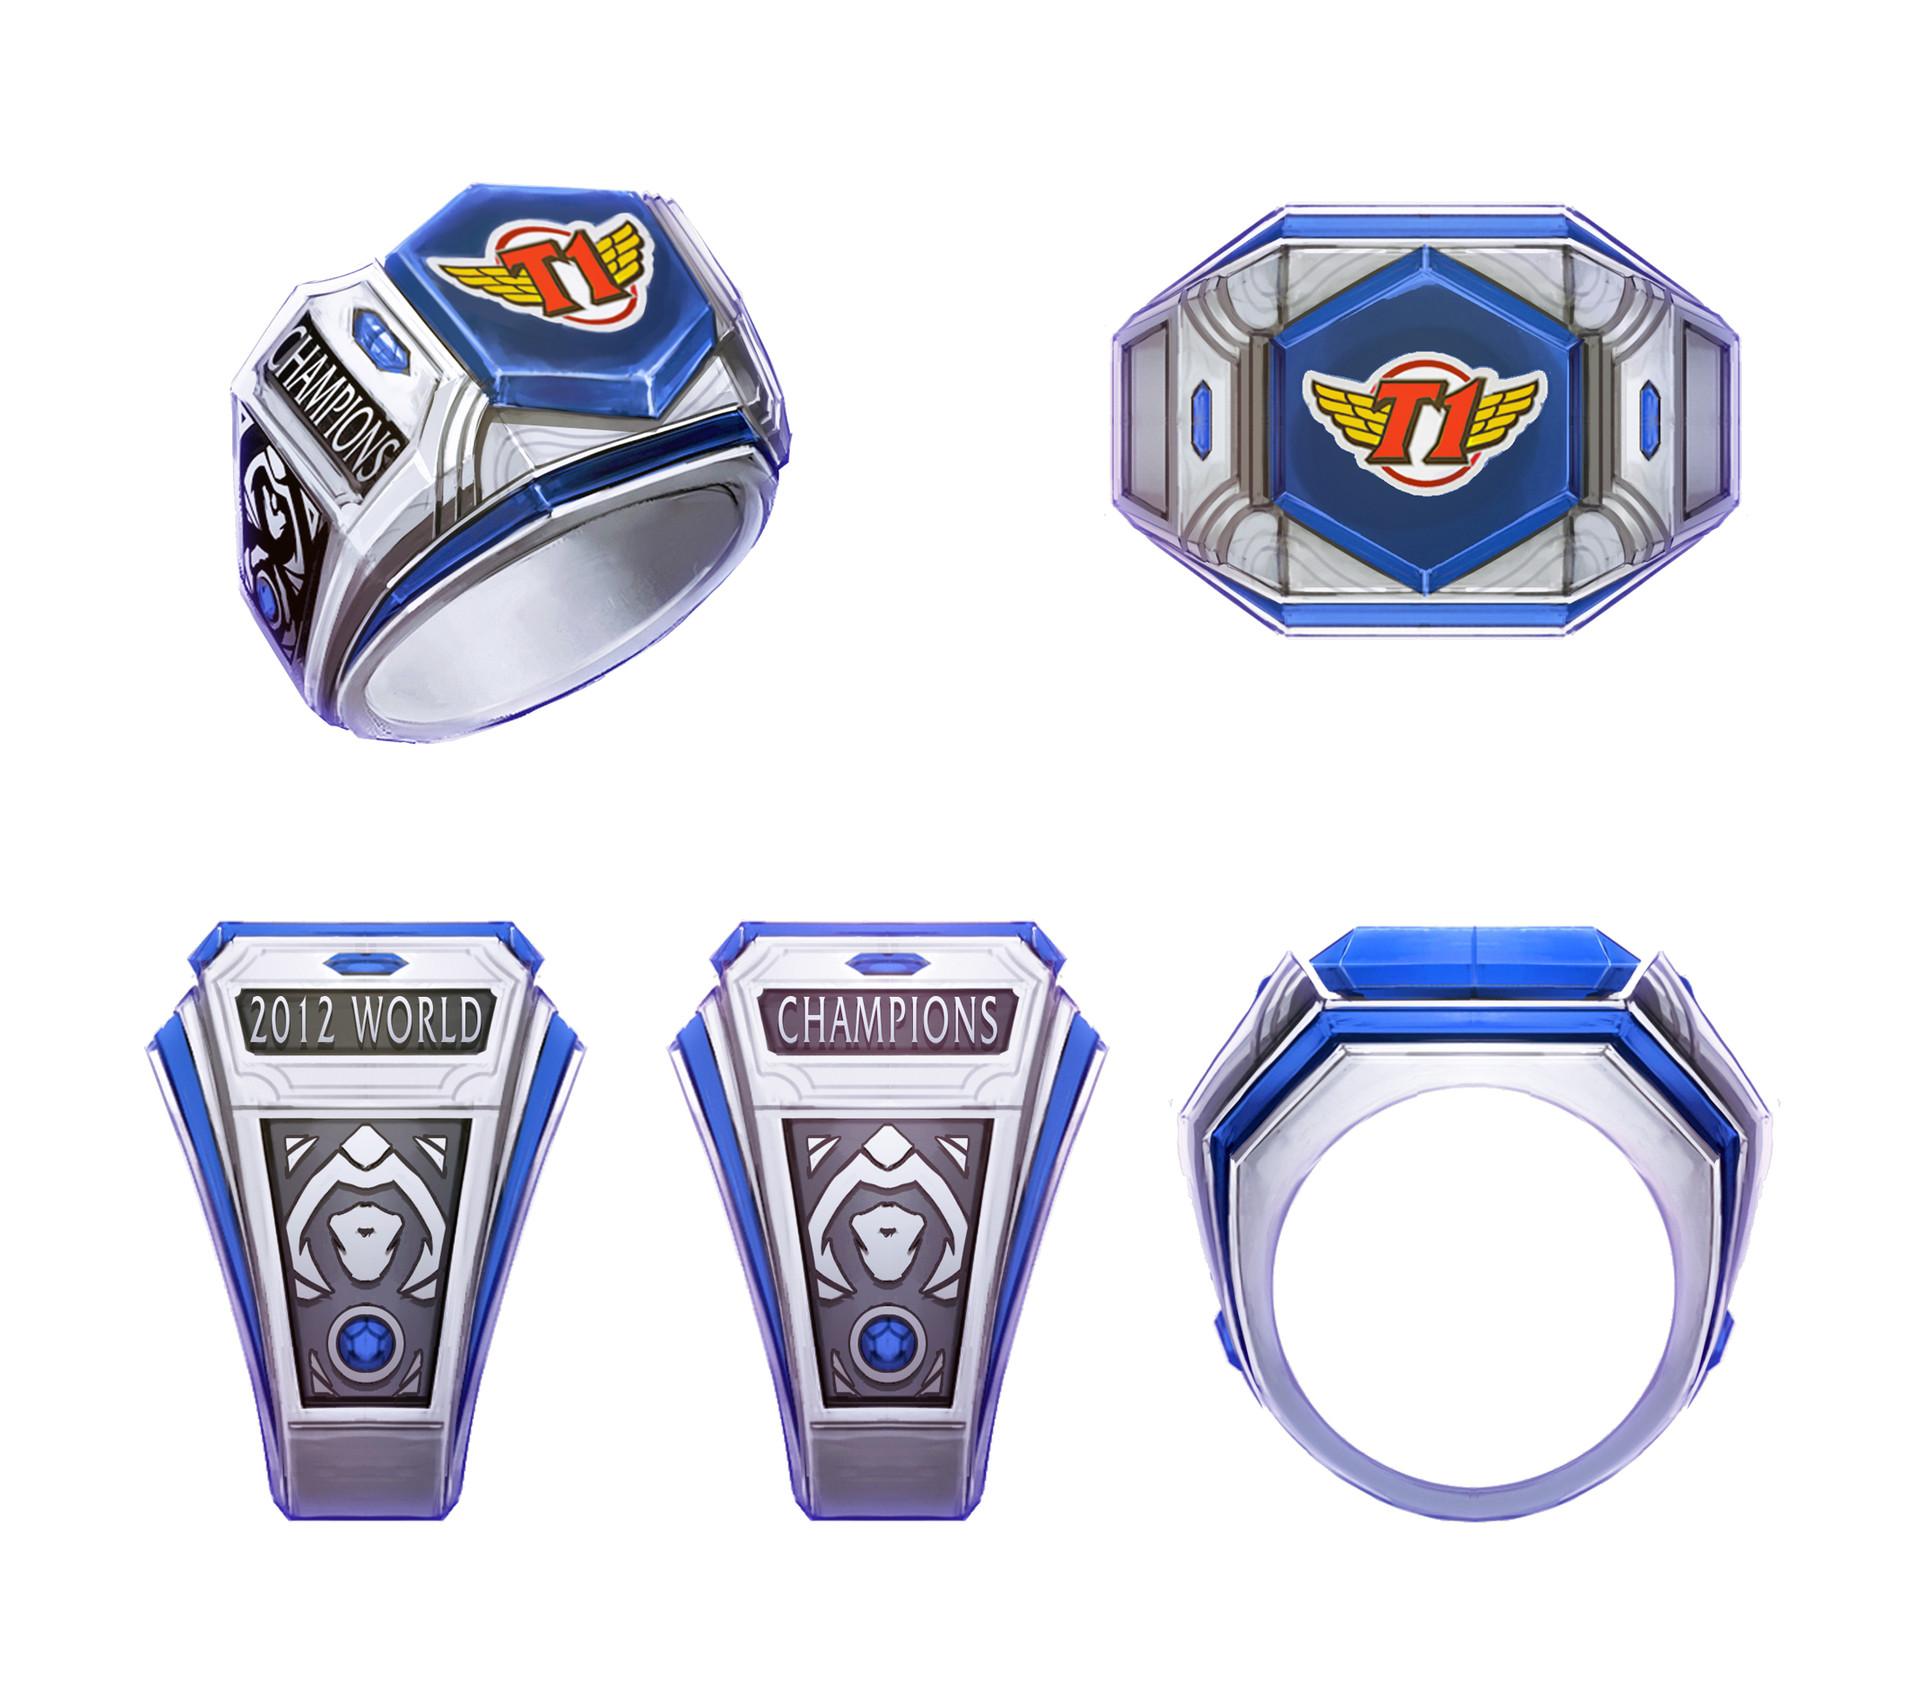 2012 Championship Ring Concepts